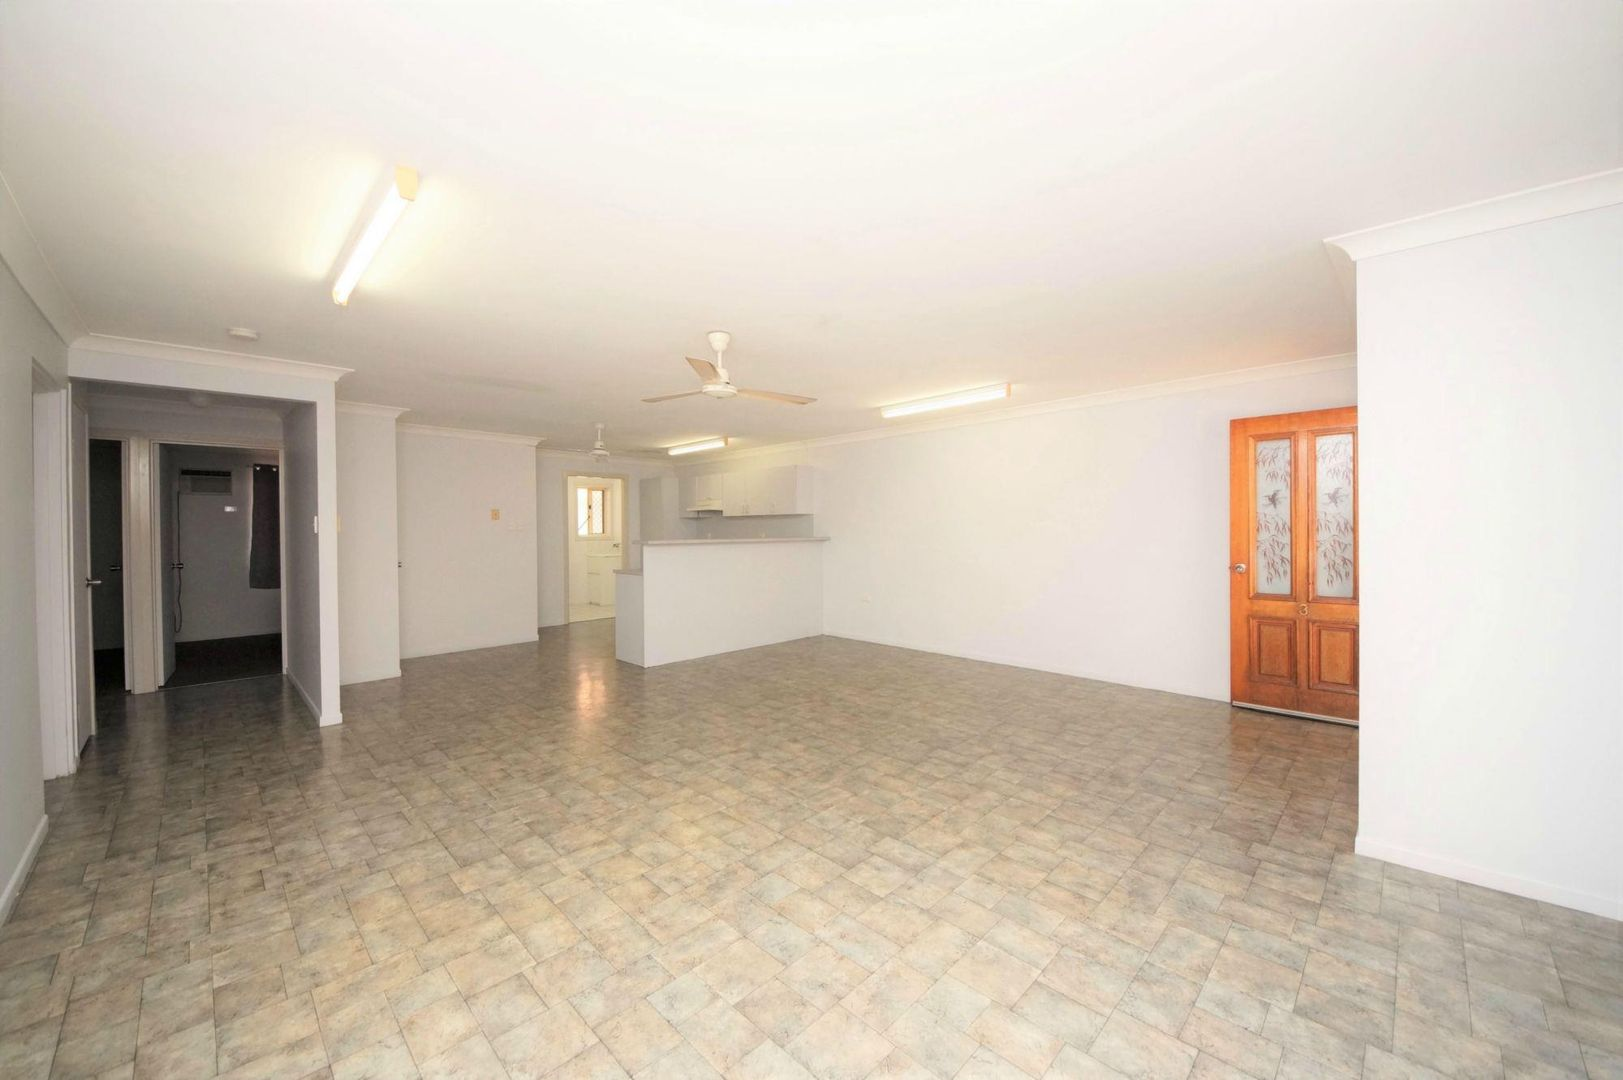 4/35 Munro Street, Ayr QLD 4807, Image 1